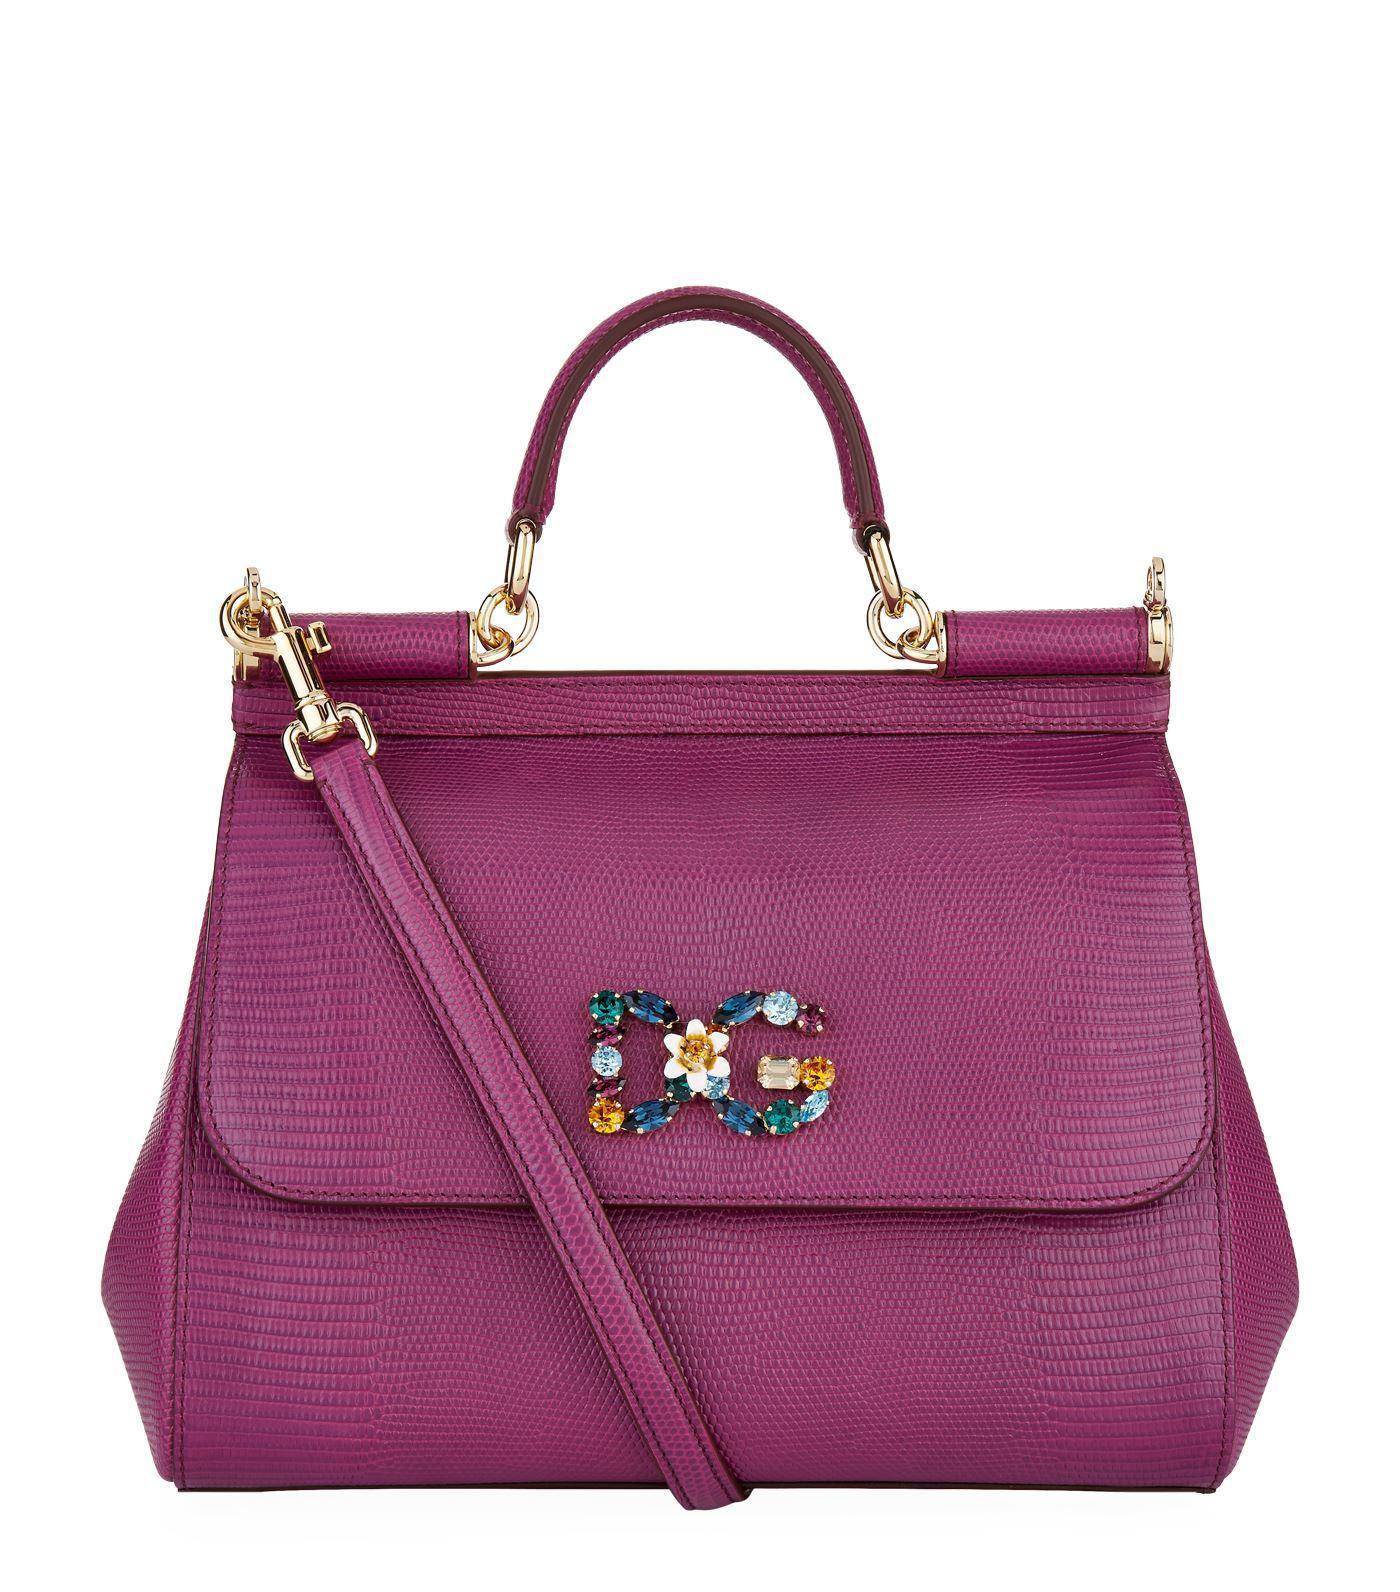 Dolce   Gabbana Medium Iguana Print Sicily Bag in Purple - Lyst 78ed9b8705a